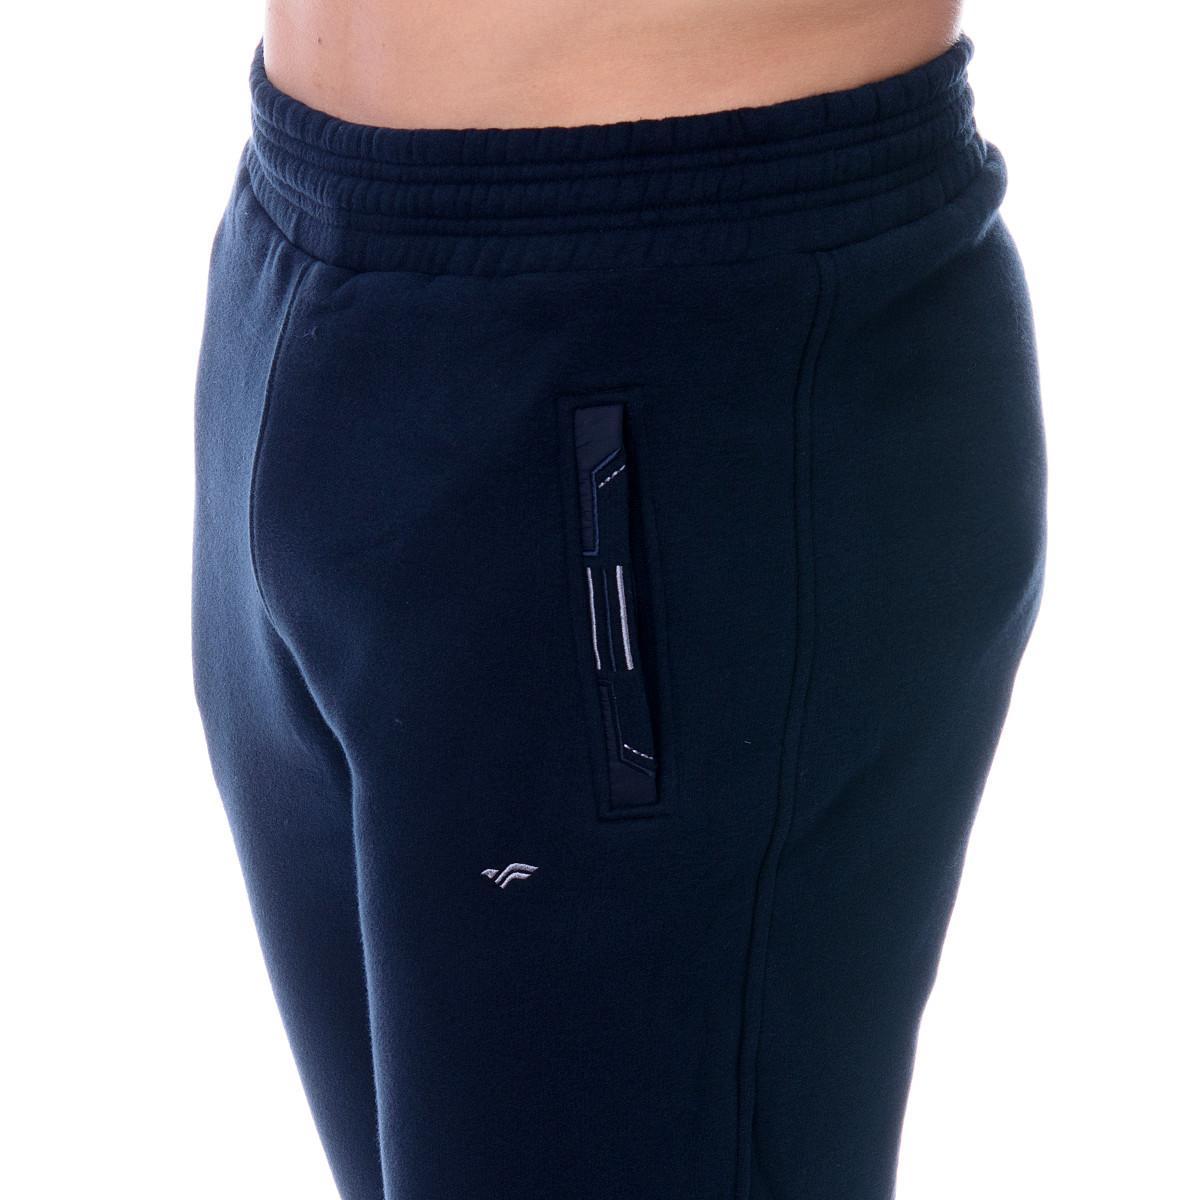 Теплые брюки на мужчин баталы тм. FORE 1095G